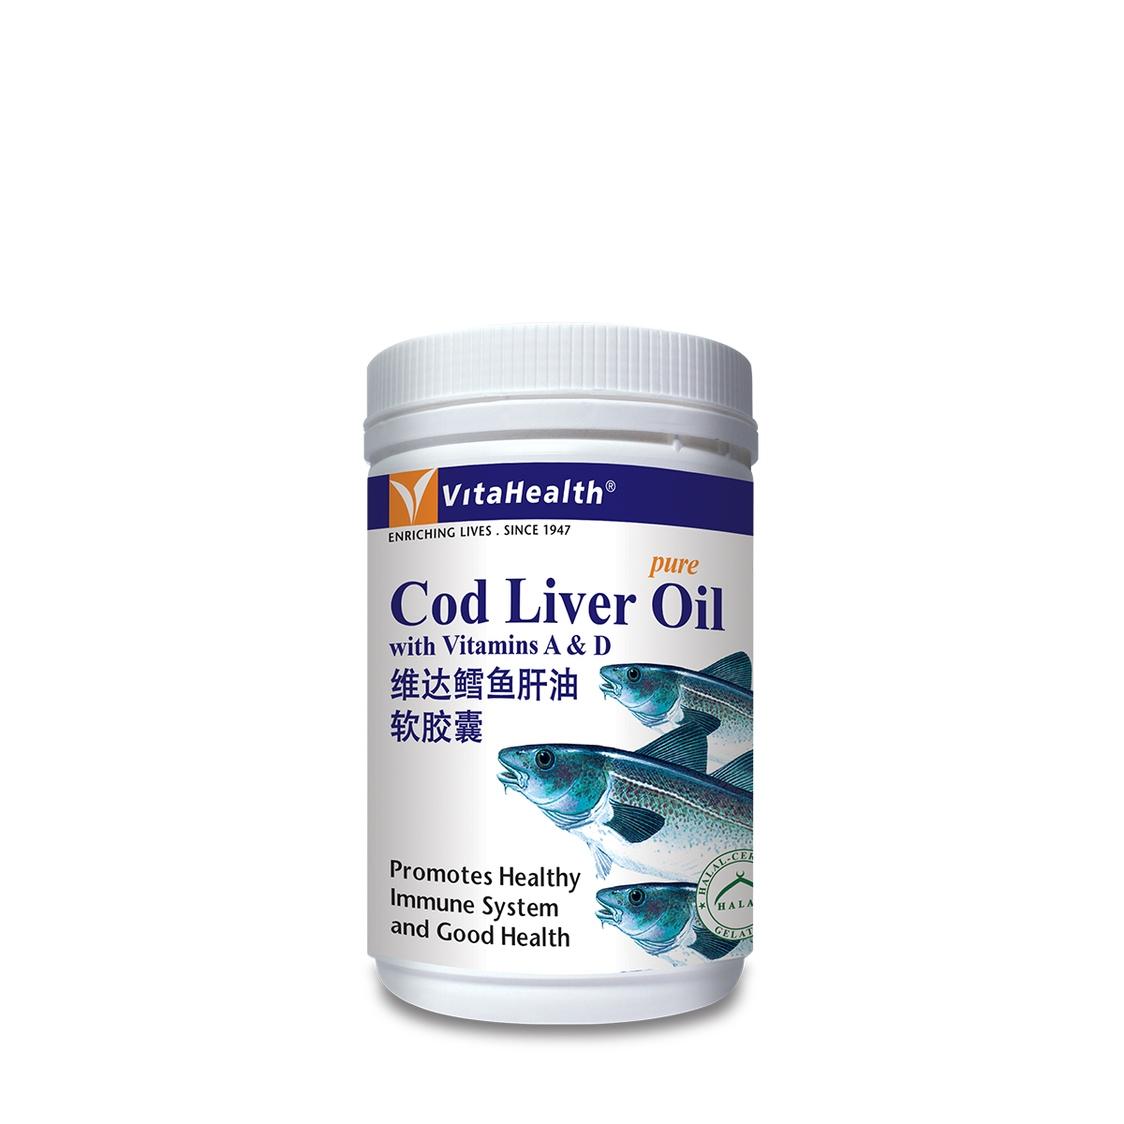 VitaHealth Cod Liver Oil 500 Softgels